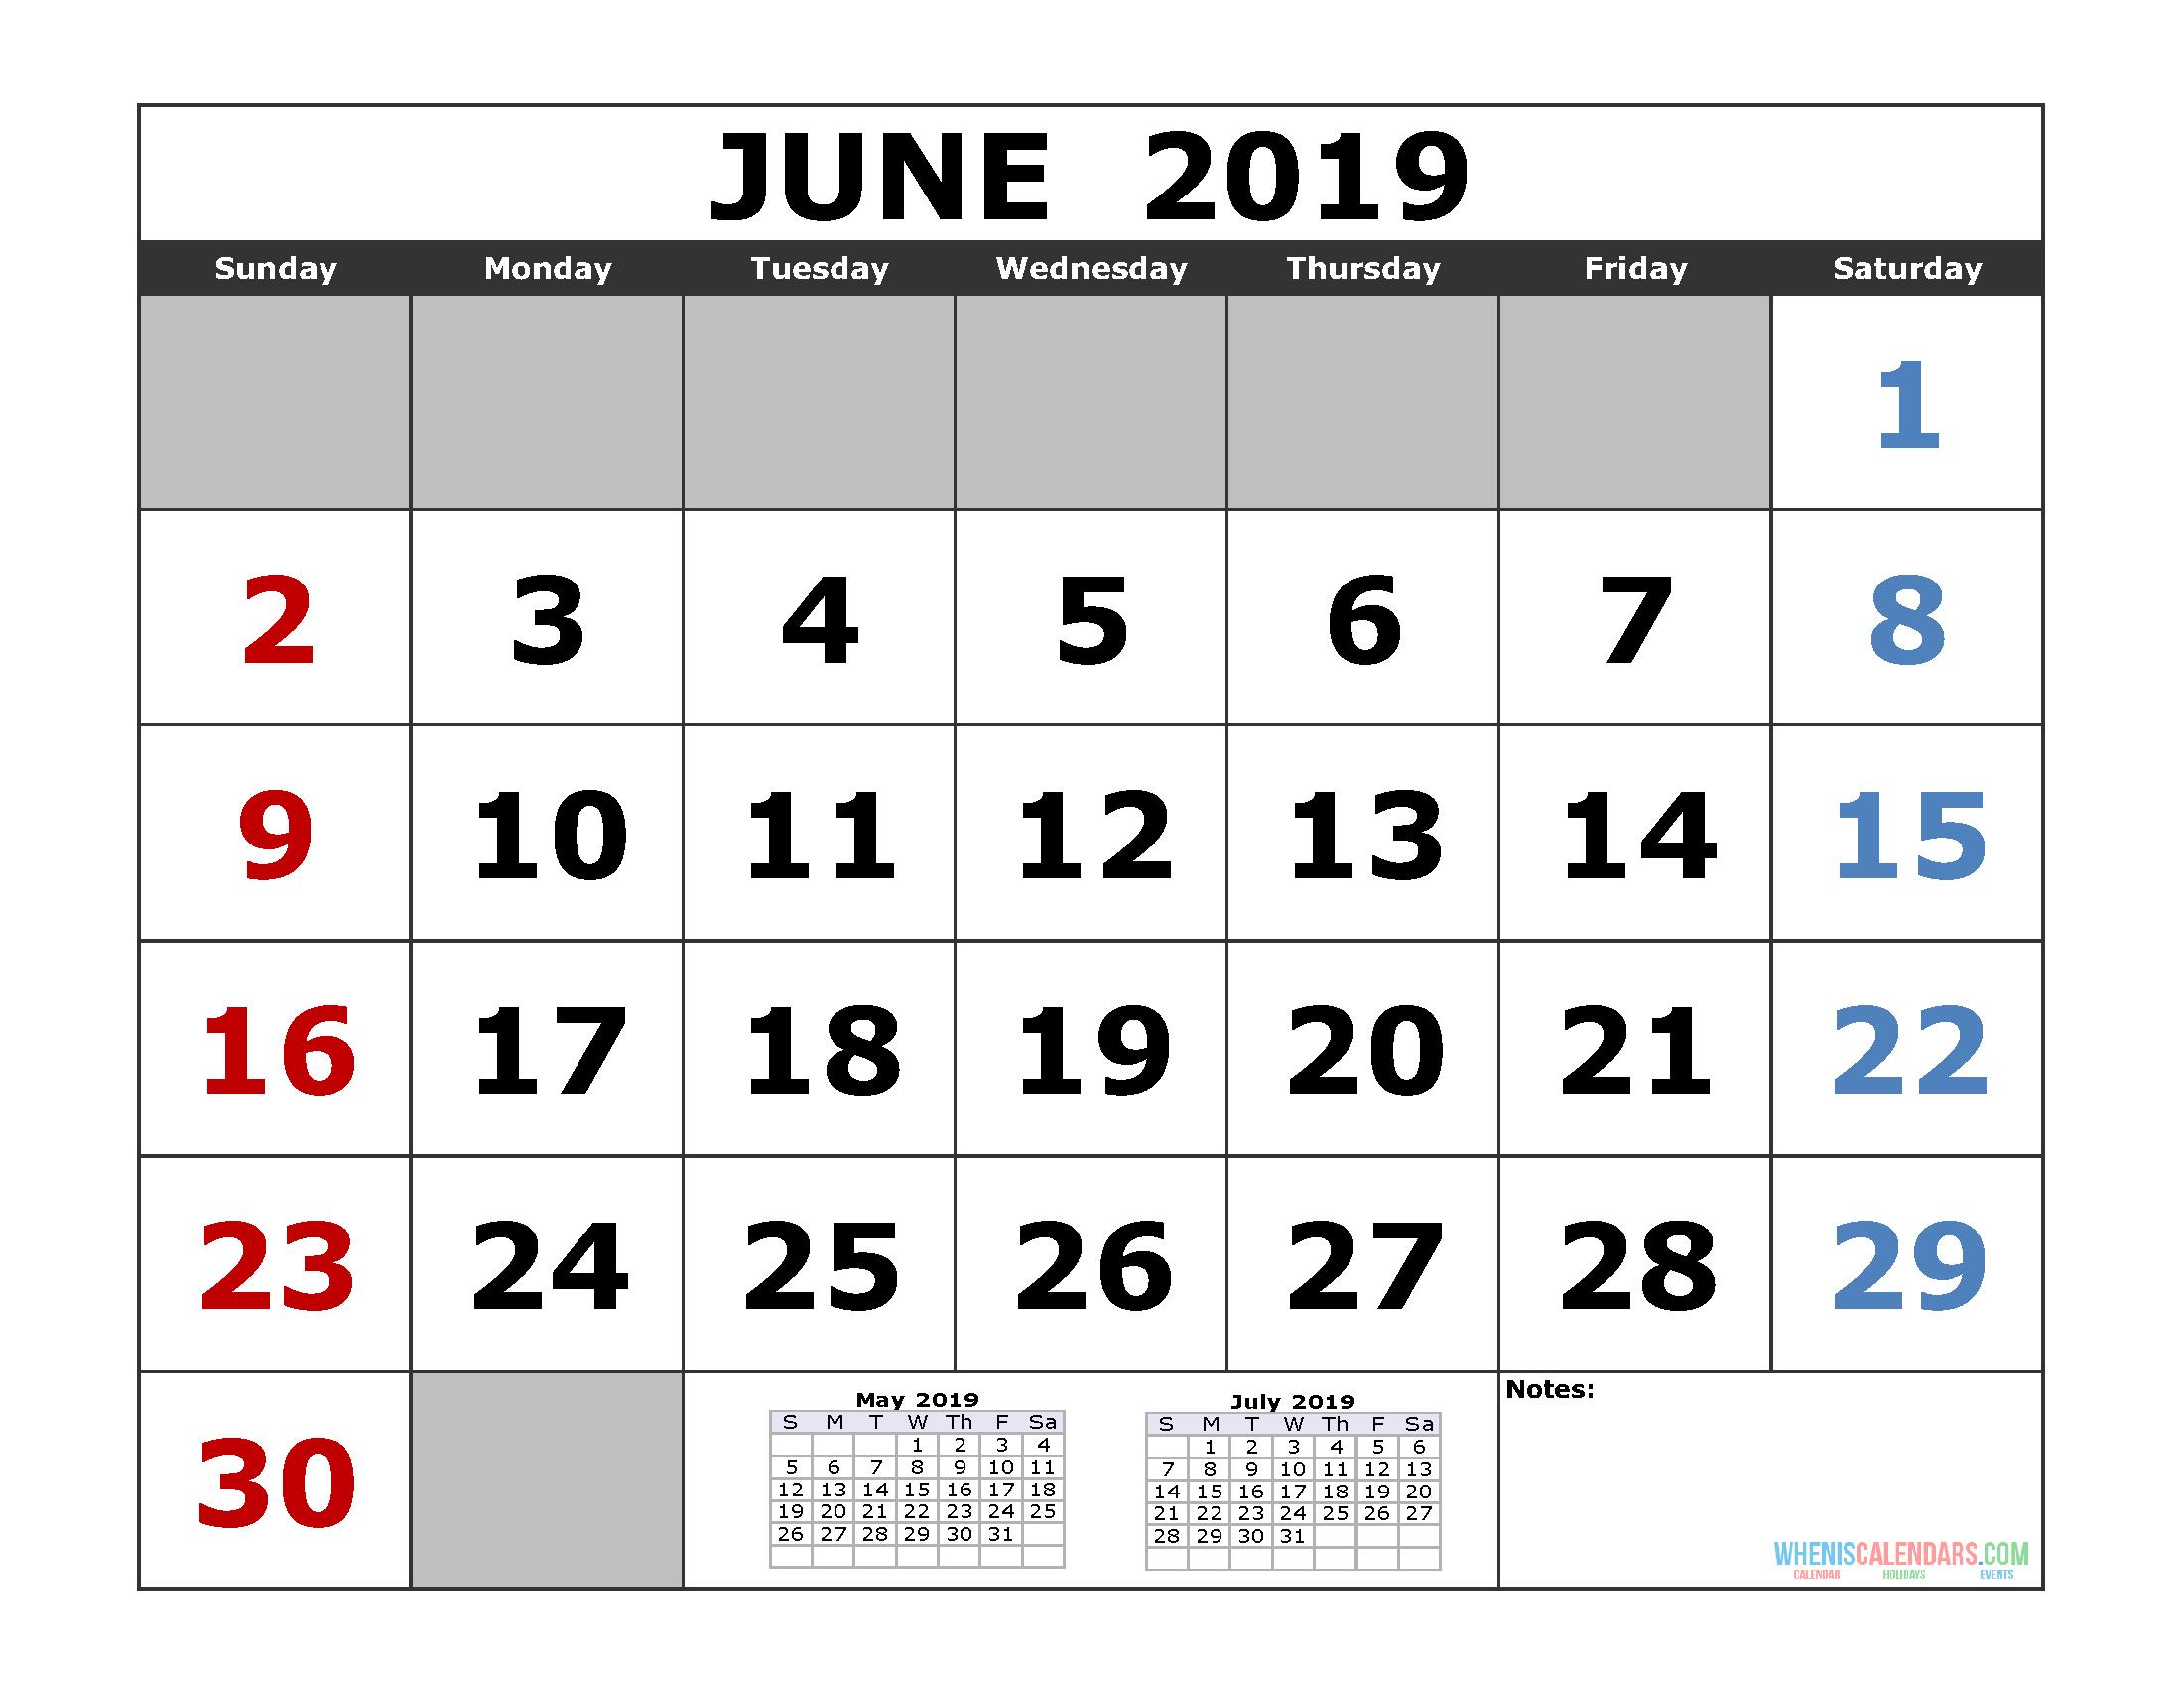 June 2019 Printable Calendar Template (3 Month Calendar)   Free June 7 2019 Calendar